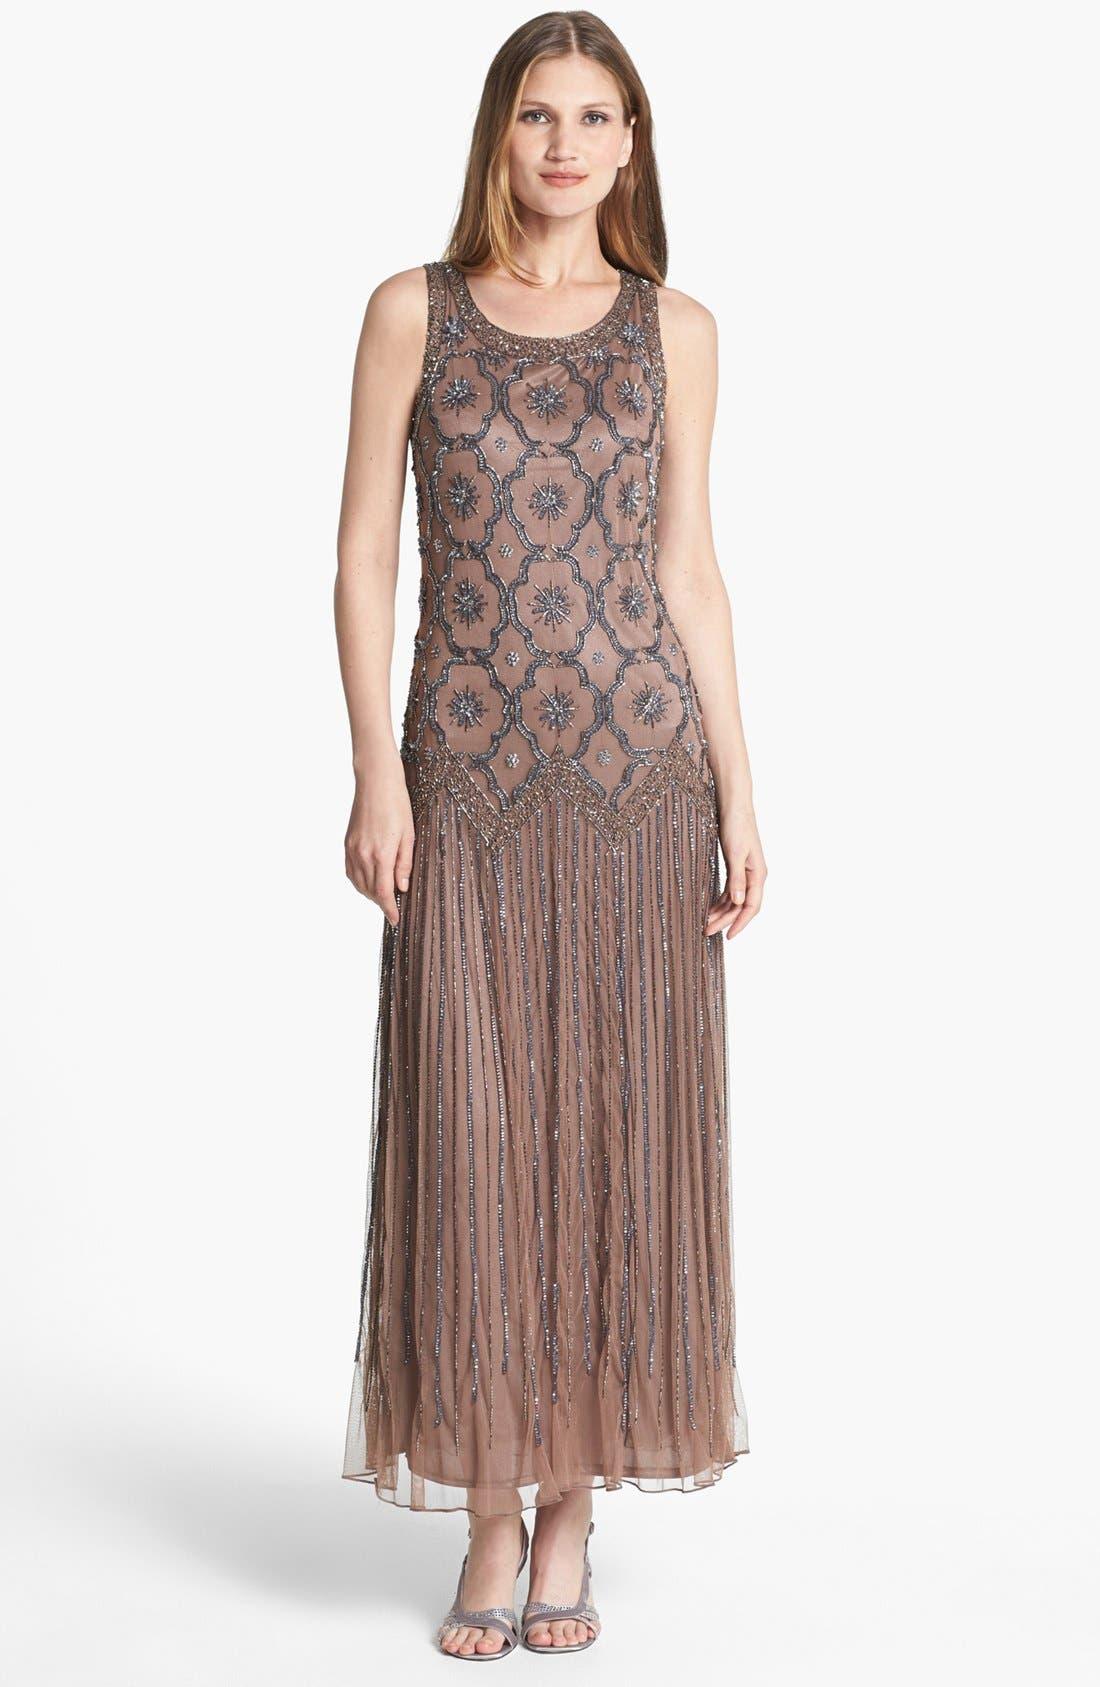 Alternate Image 1 Selected - Pisarro Nights Embellished Drop Waist Midi Dress